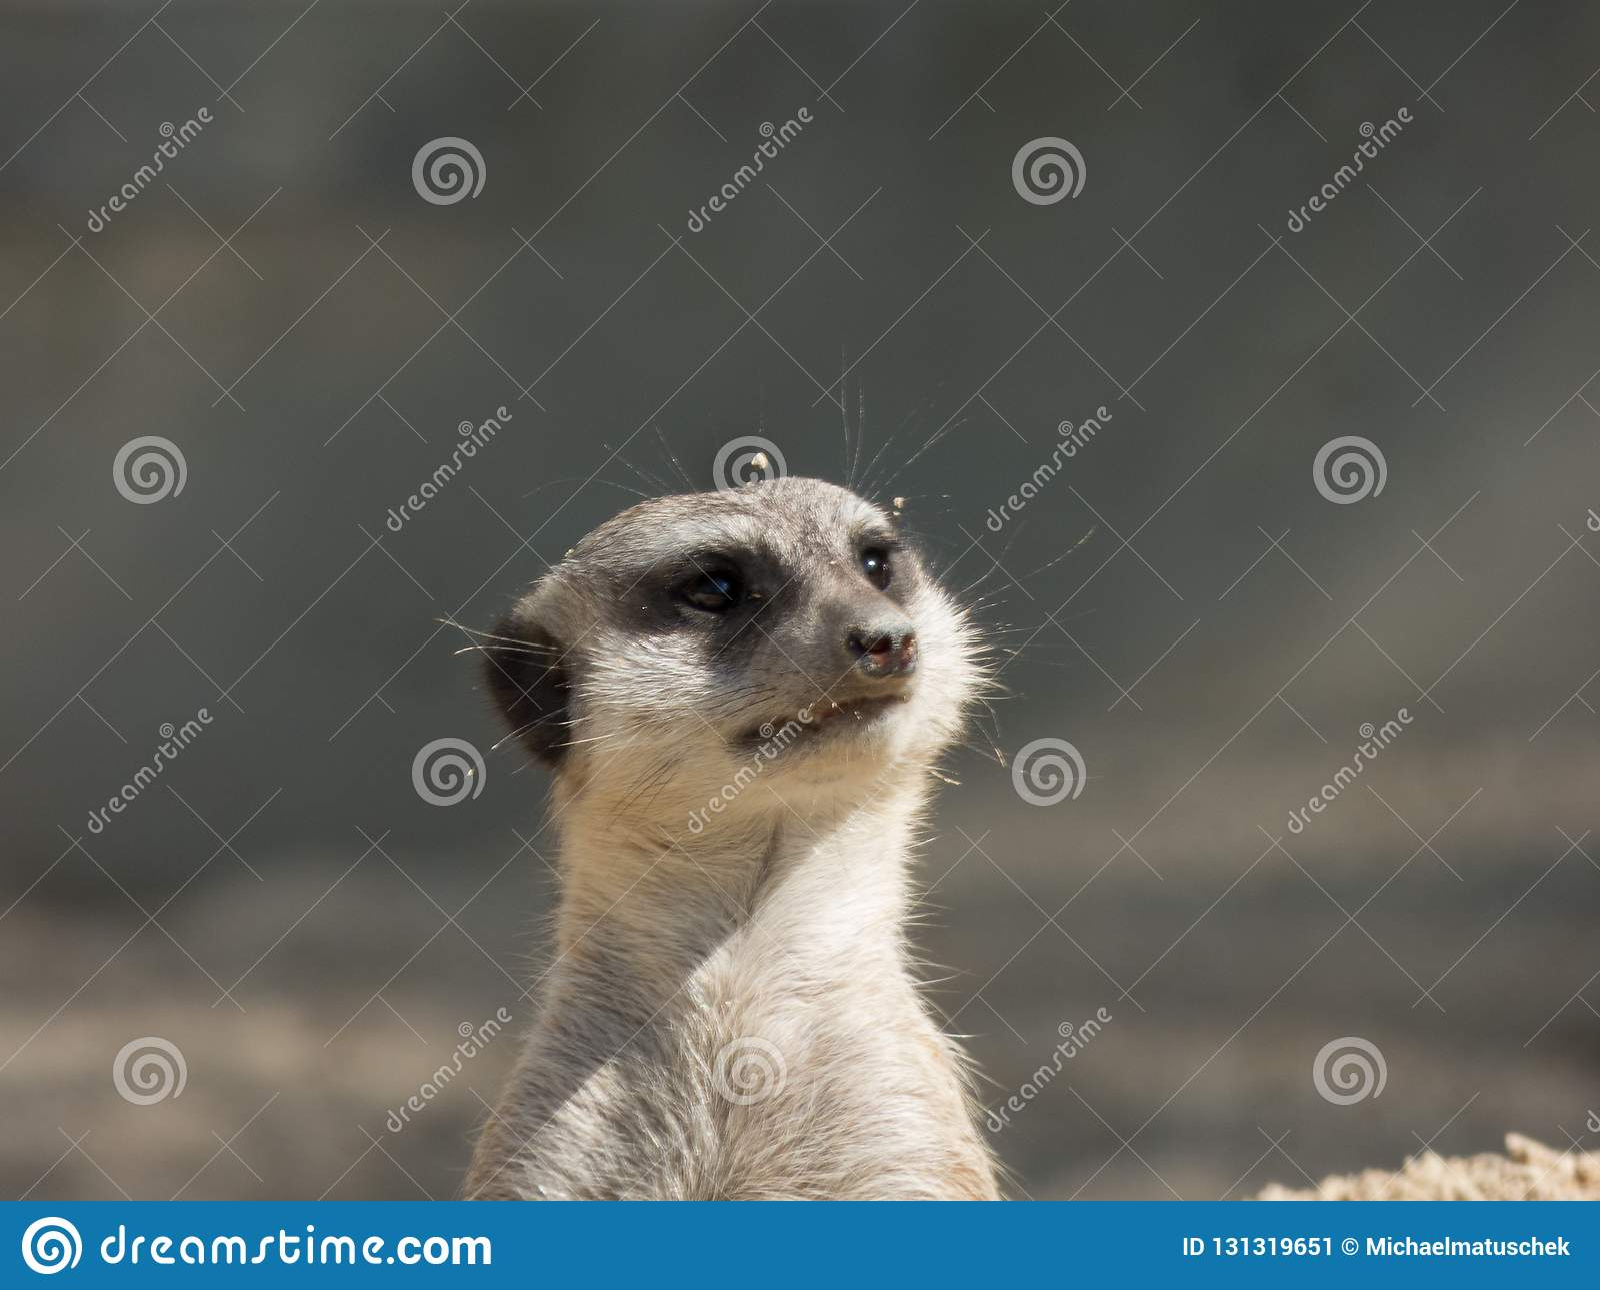 Kilka meerkats w zoo, siedzi na piasku